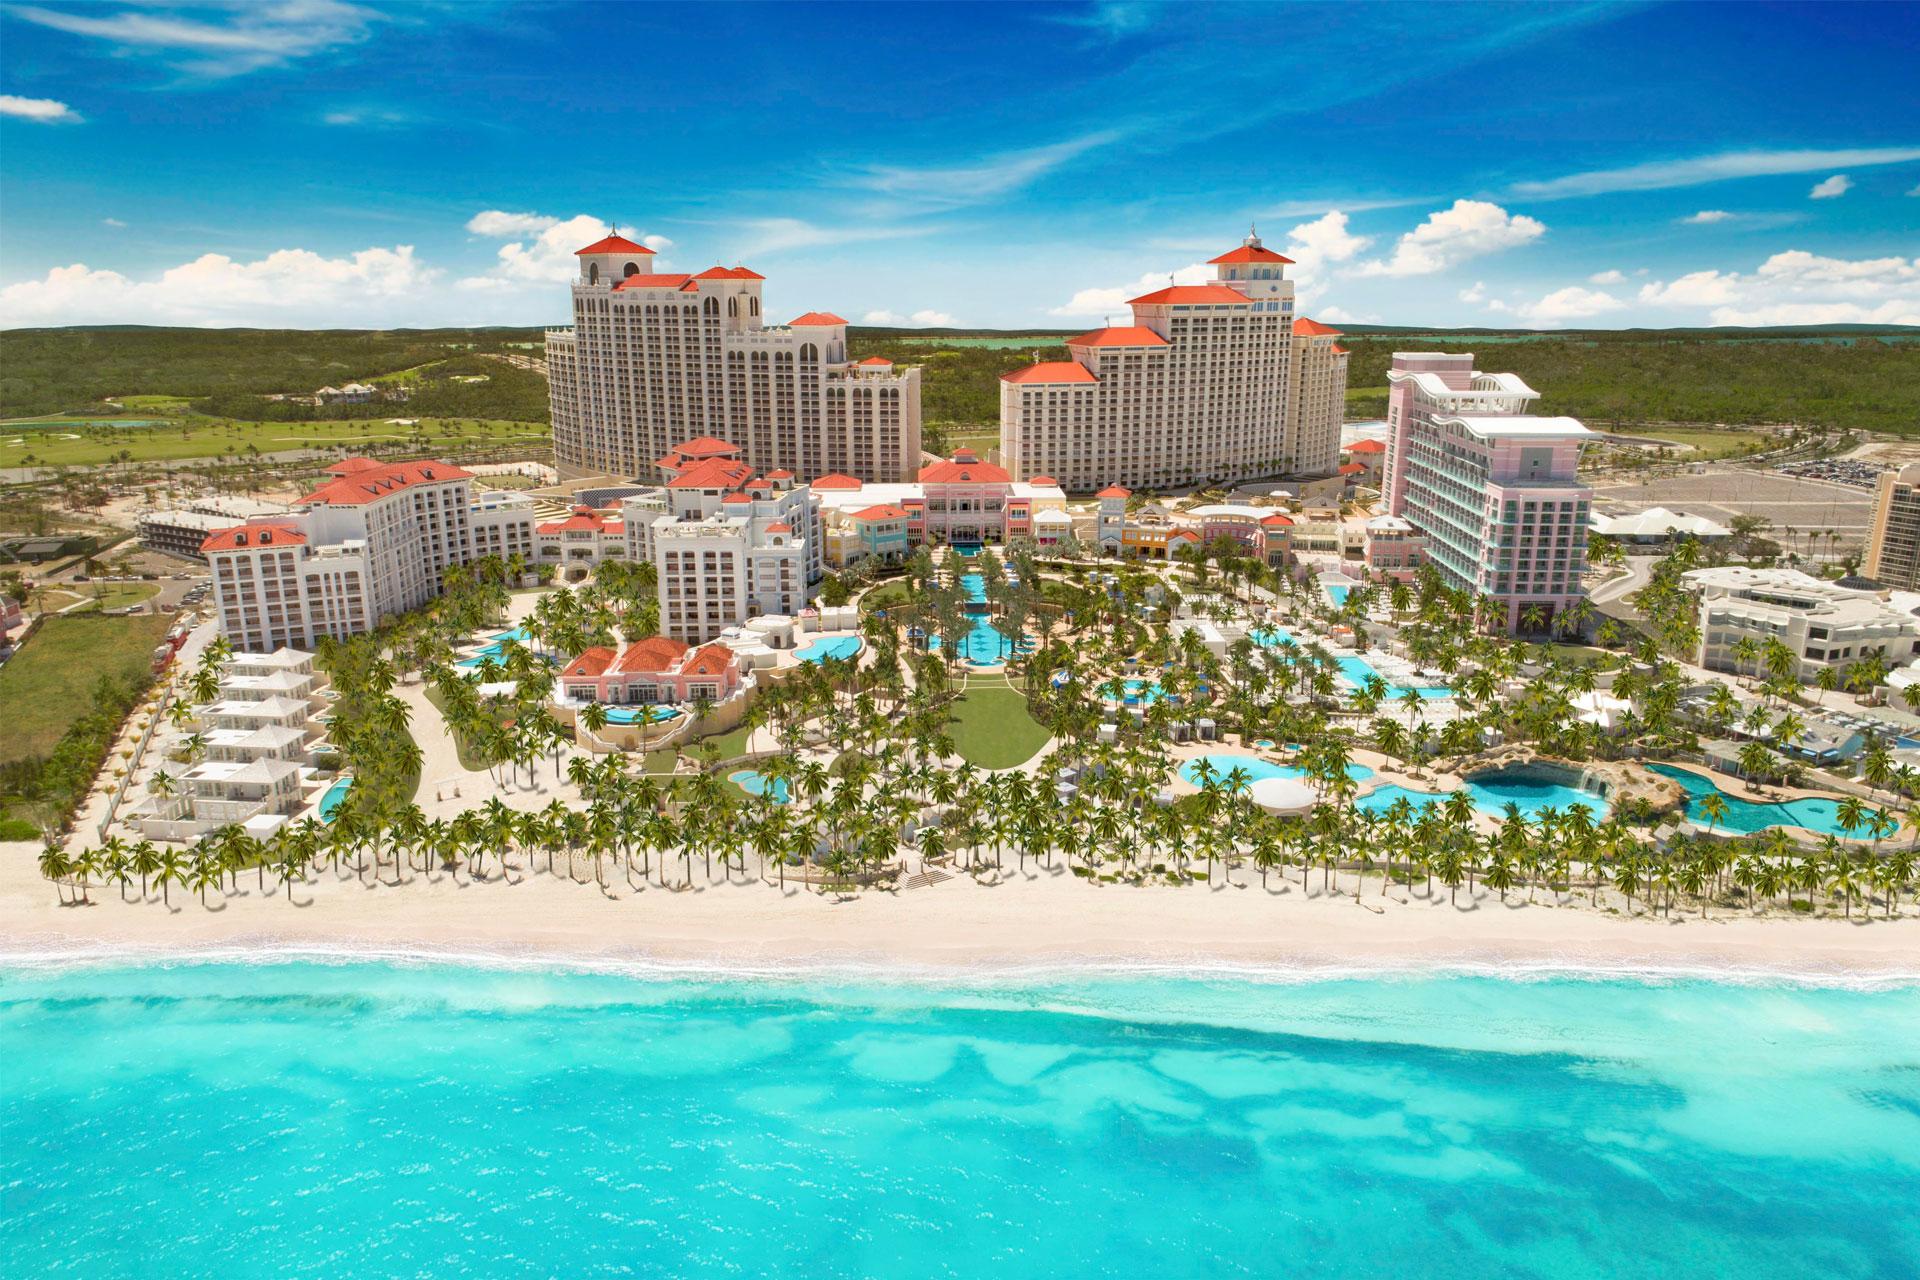 Baha Mar Resort Exterior; Courtesy of Baha Mar Resort